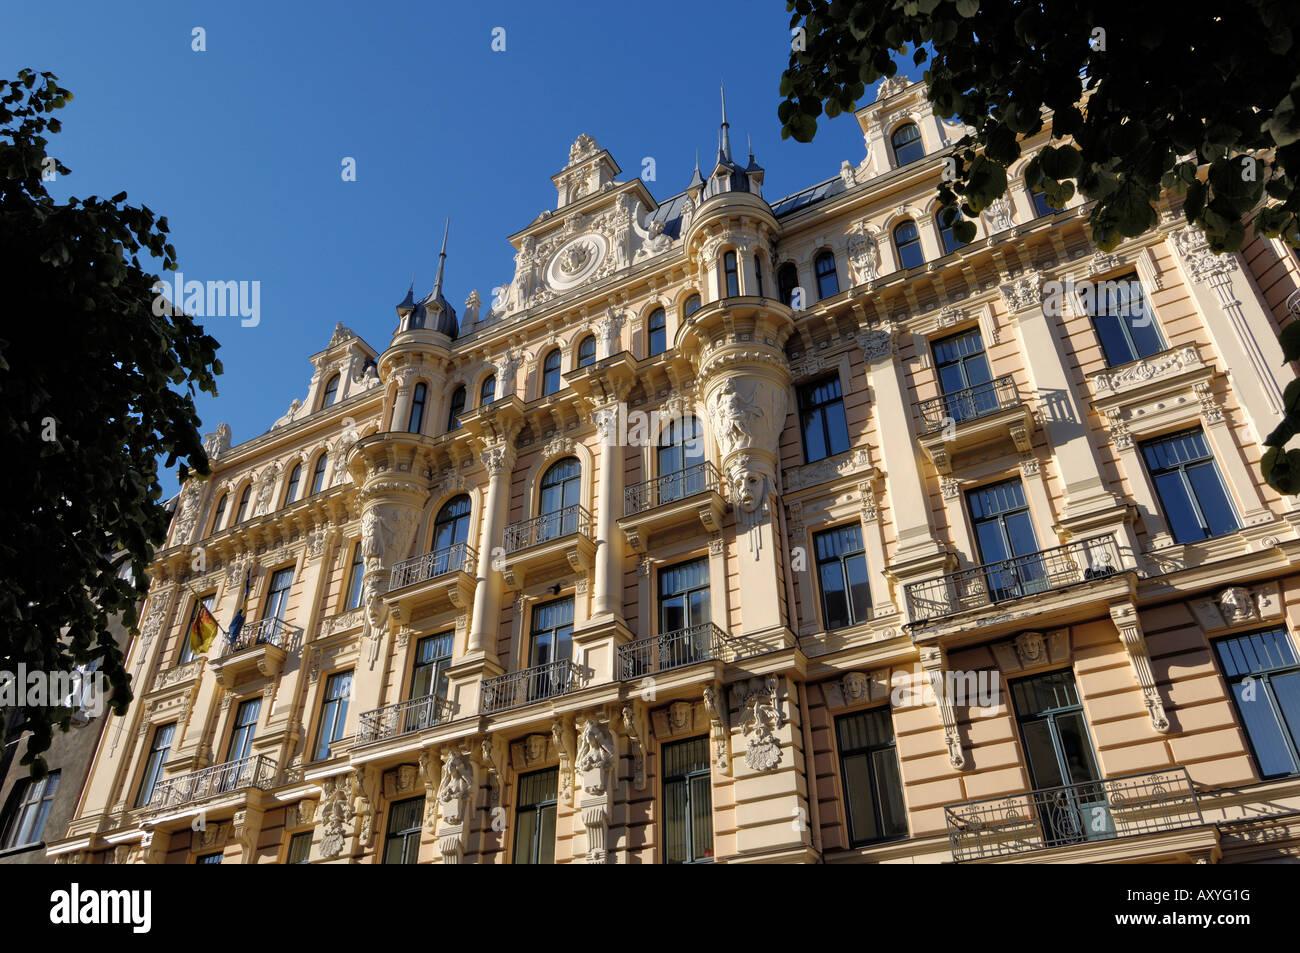 Art Nouveau architecture, 13 Alberta iela, Riga, Lativa, Baltic States, Europe - Stock Image